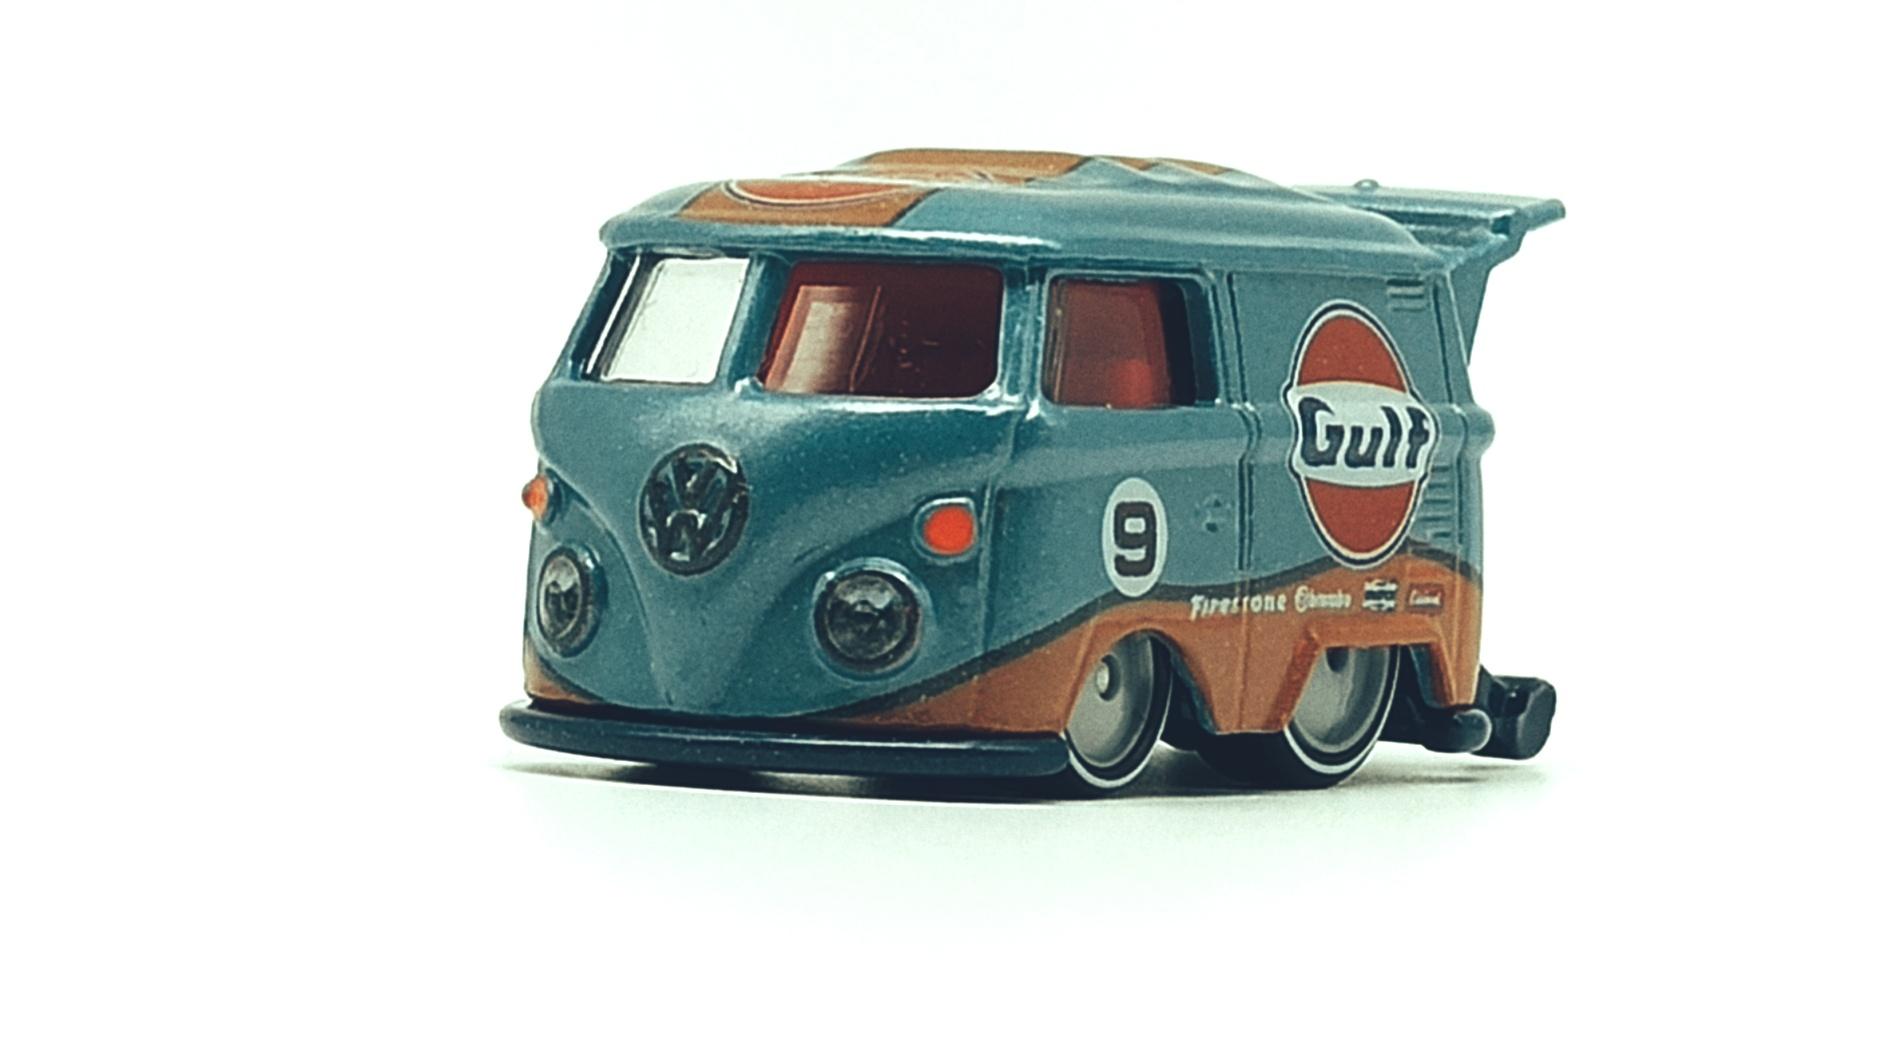 Hot Wheels Volkswagen Kool Kombi spectraflame light blue (Gulf) Custom VW front angle